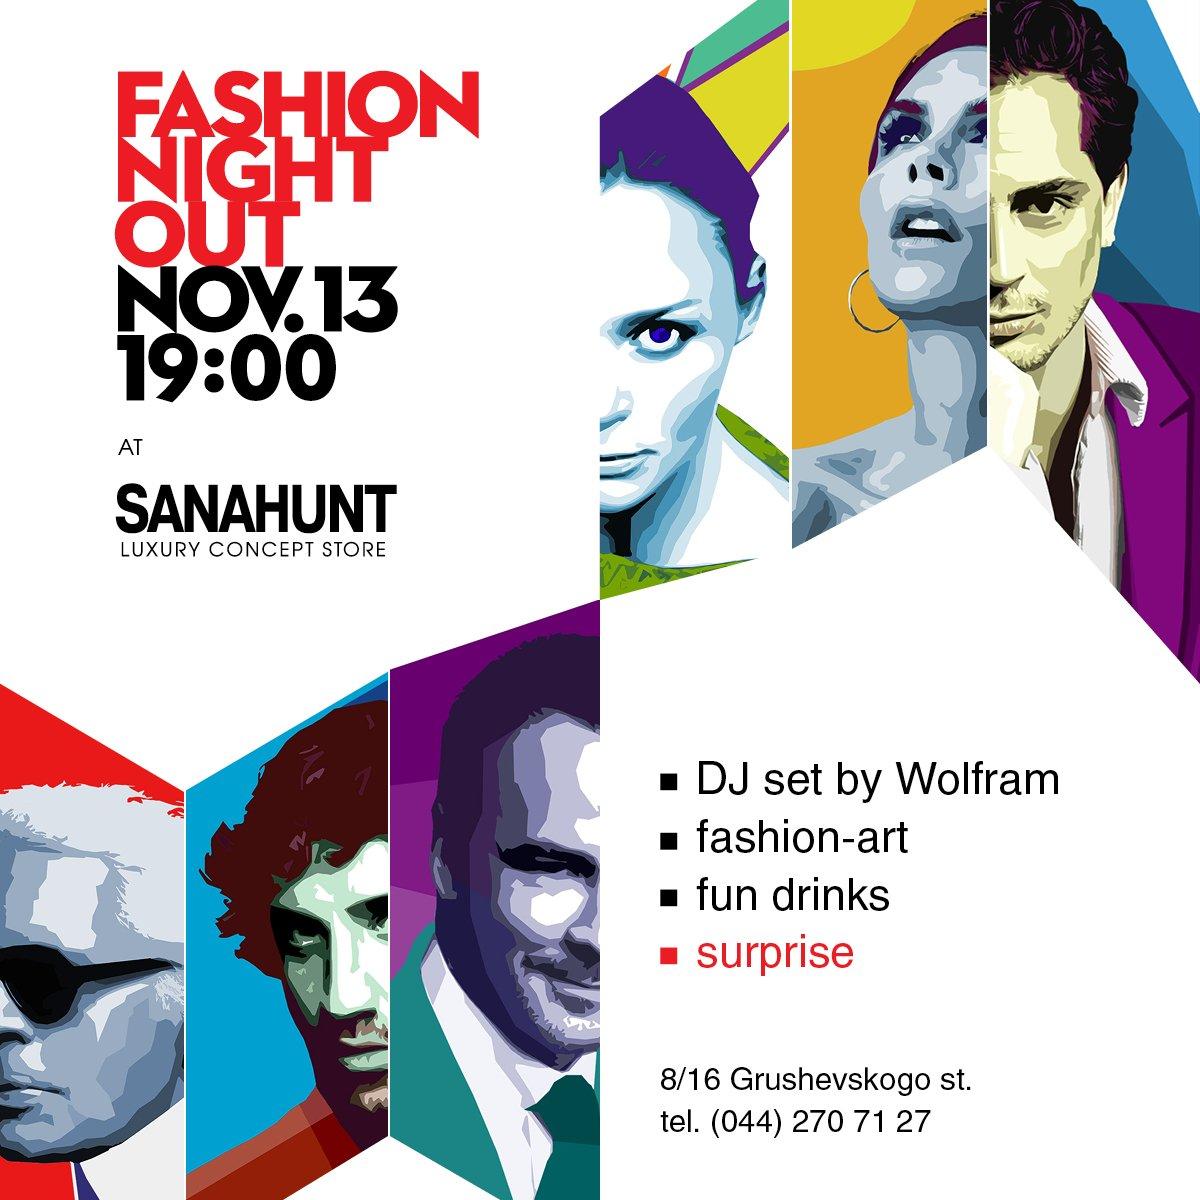 Sanahunt приглашает своих дорогих клиентов на самое громкое модное мероприятие осени – Fashion's Night Out. https://t.co/9nt6cDnuTC